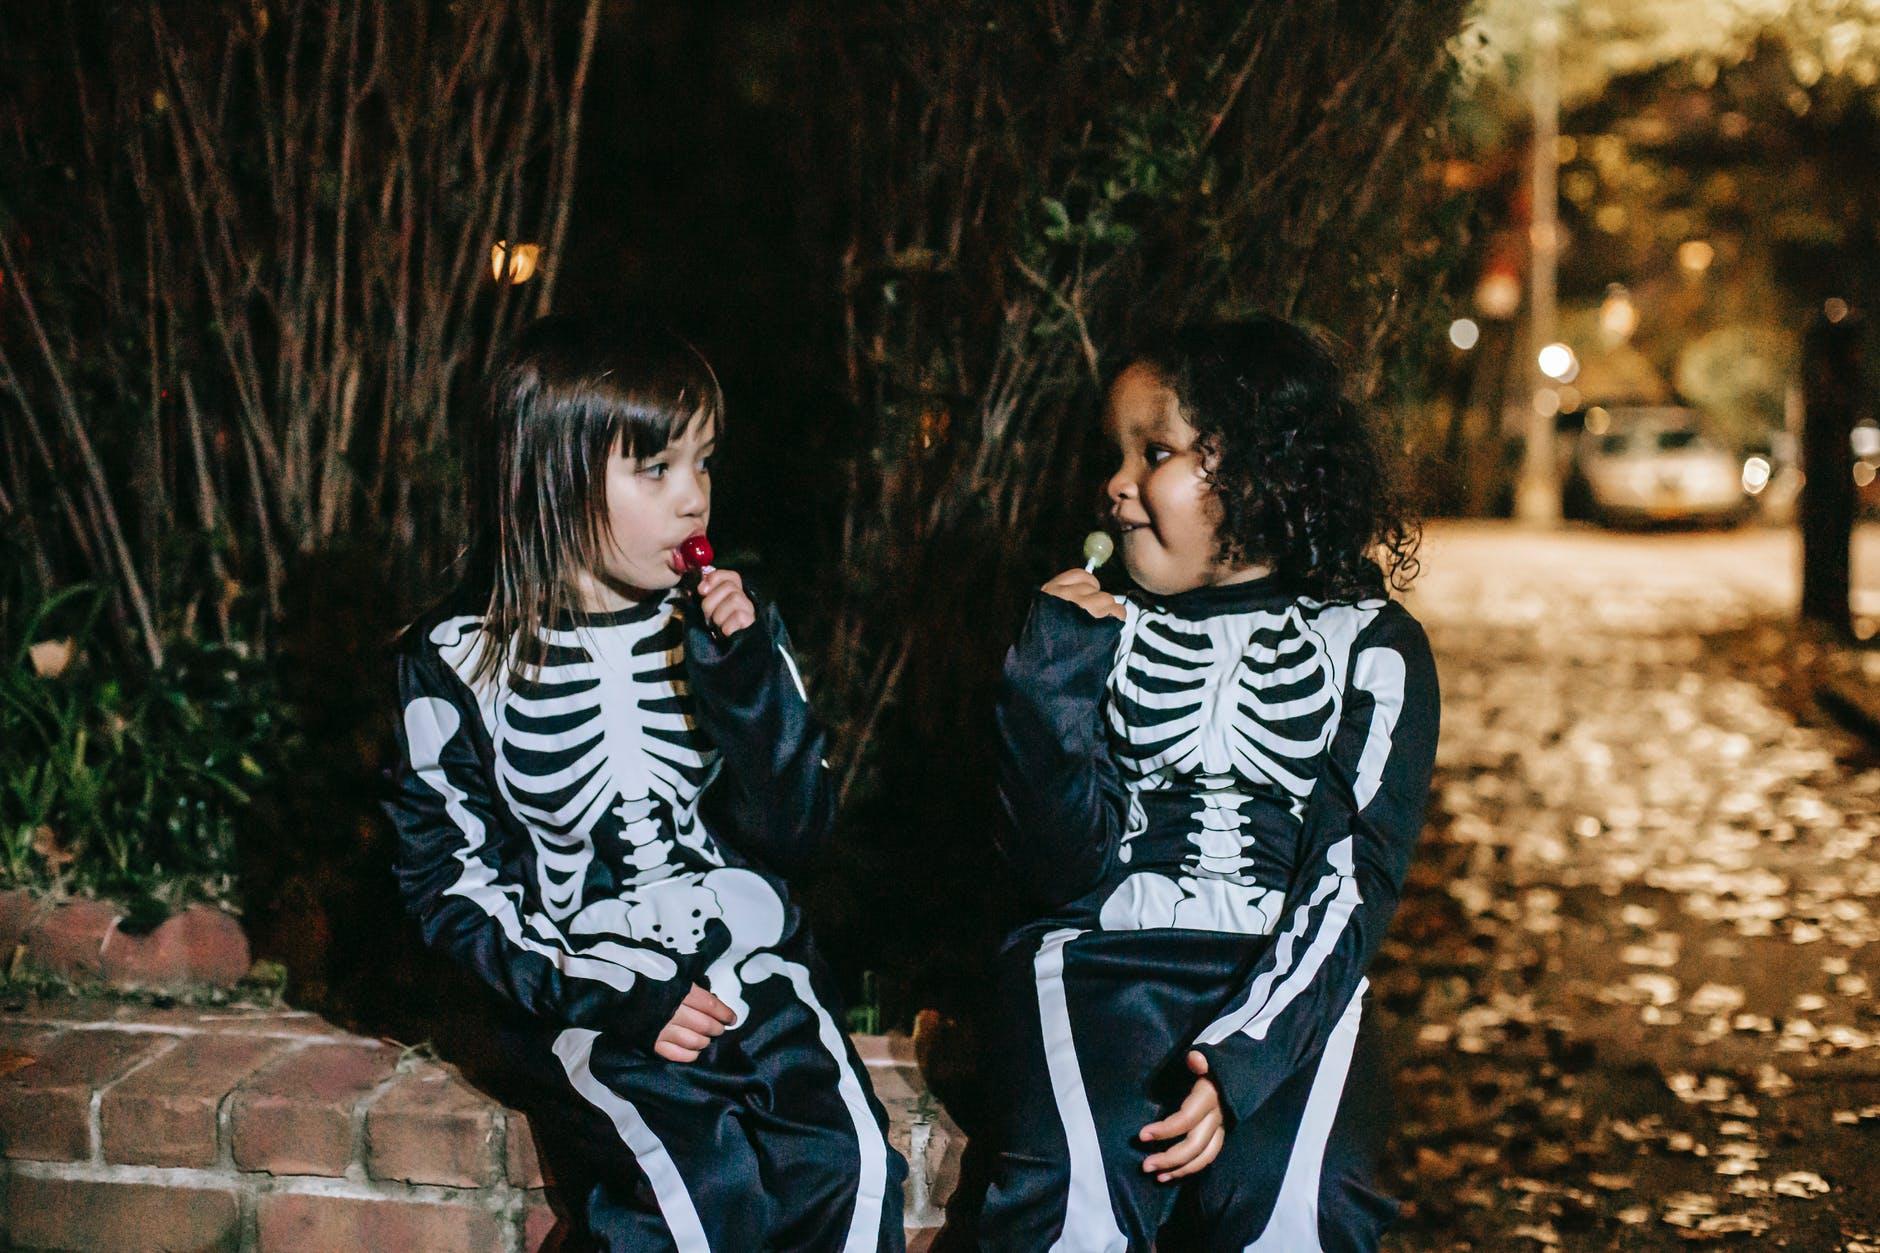 multiethnic girlfriends eating tasty lollipops in park on halloween night